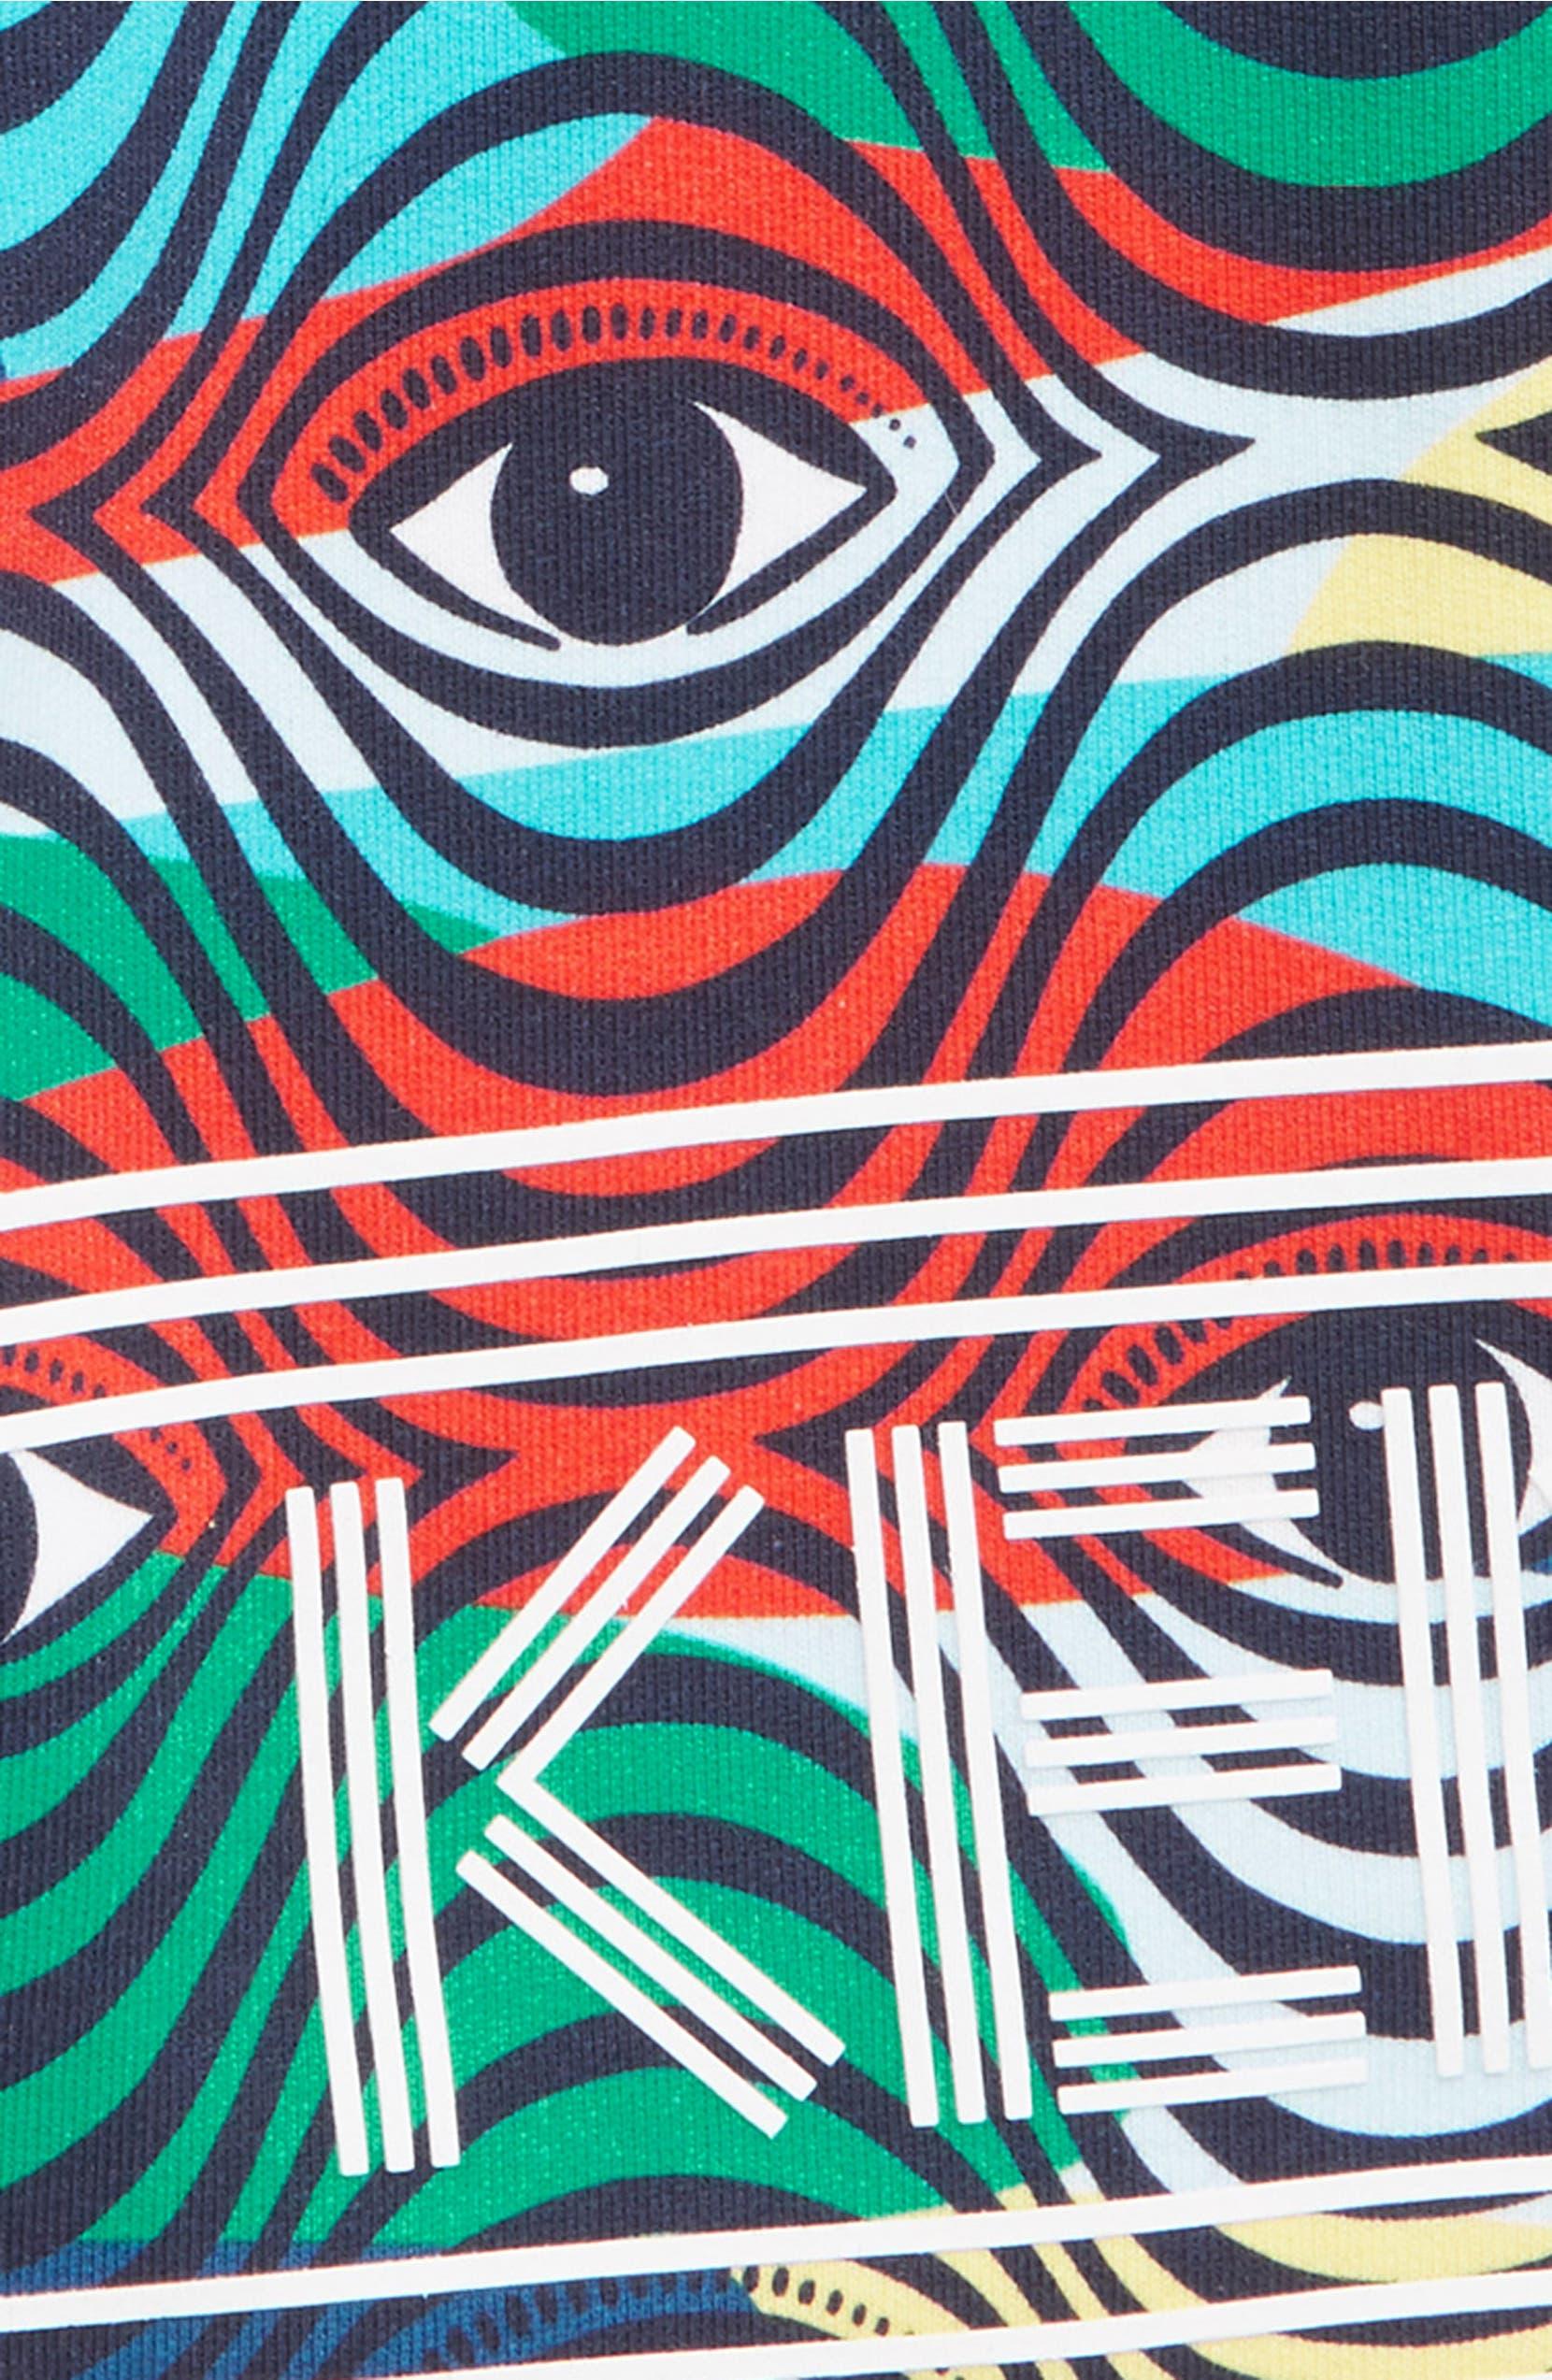 e6a2f85d KENZO Print Fleece Bermuda Shorts (Little Boys & Big Boys) | Nordstrom